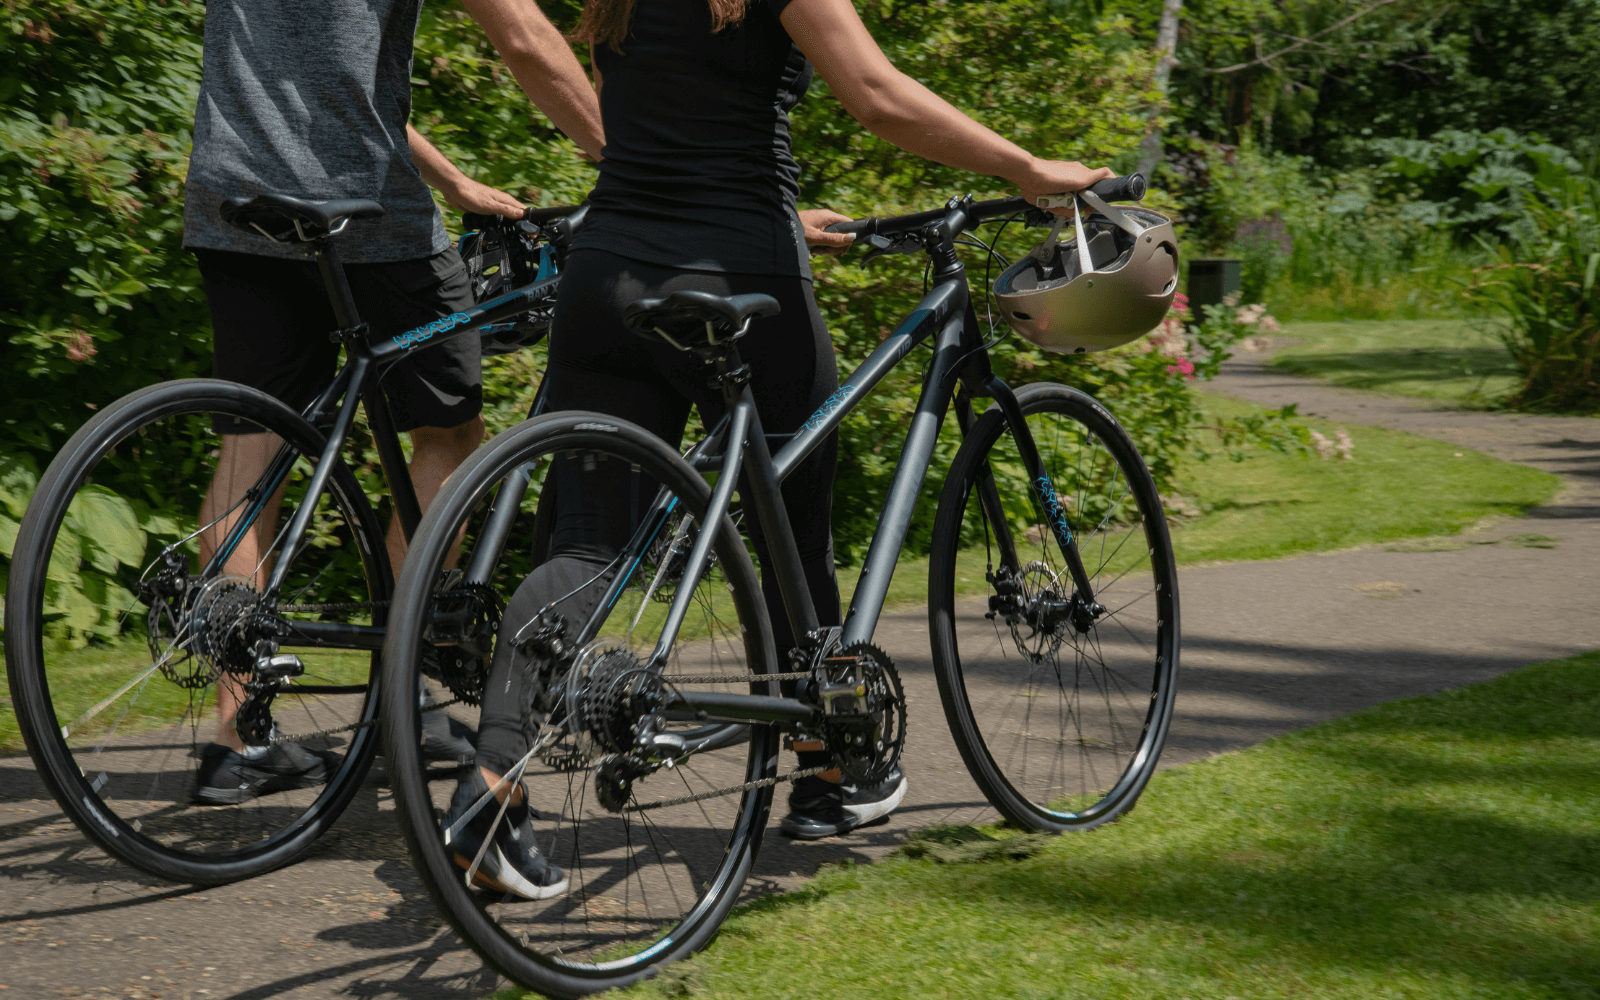 Copy of Copy of Lifestyle images 26 1 - Reid ® - Urban X1 WSD Bike